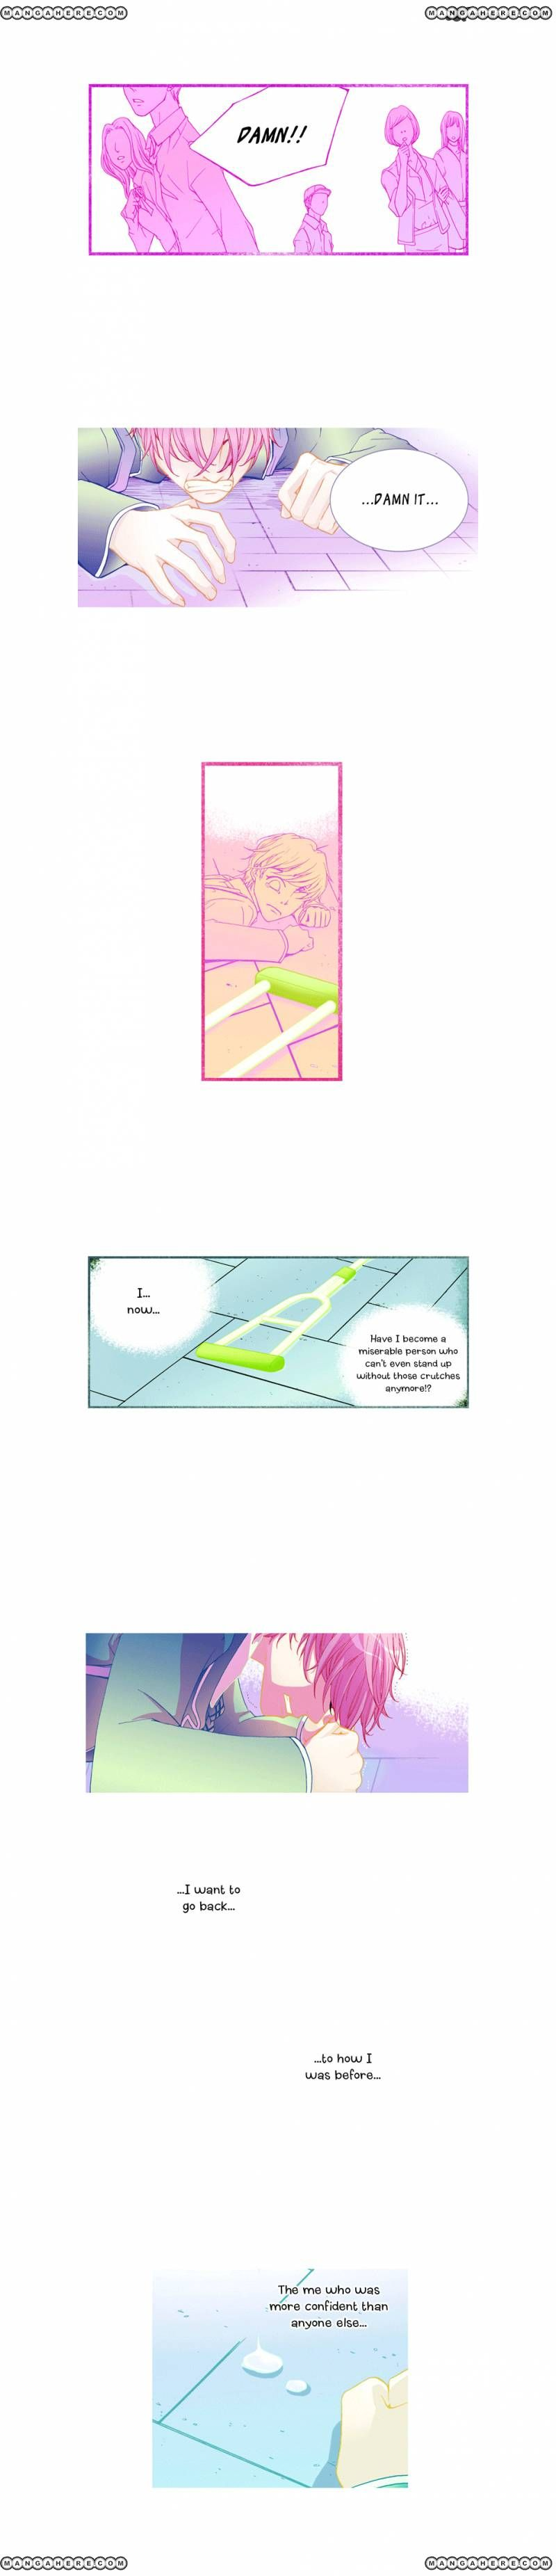 Dreaming Cat Varim 4 Page 2